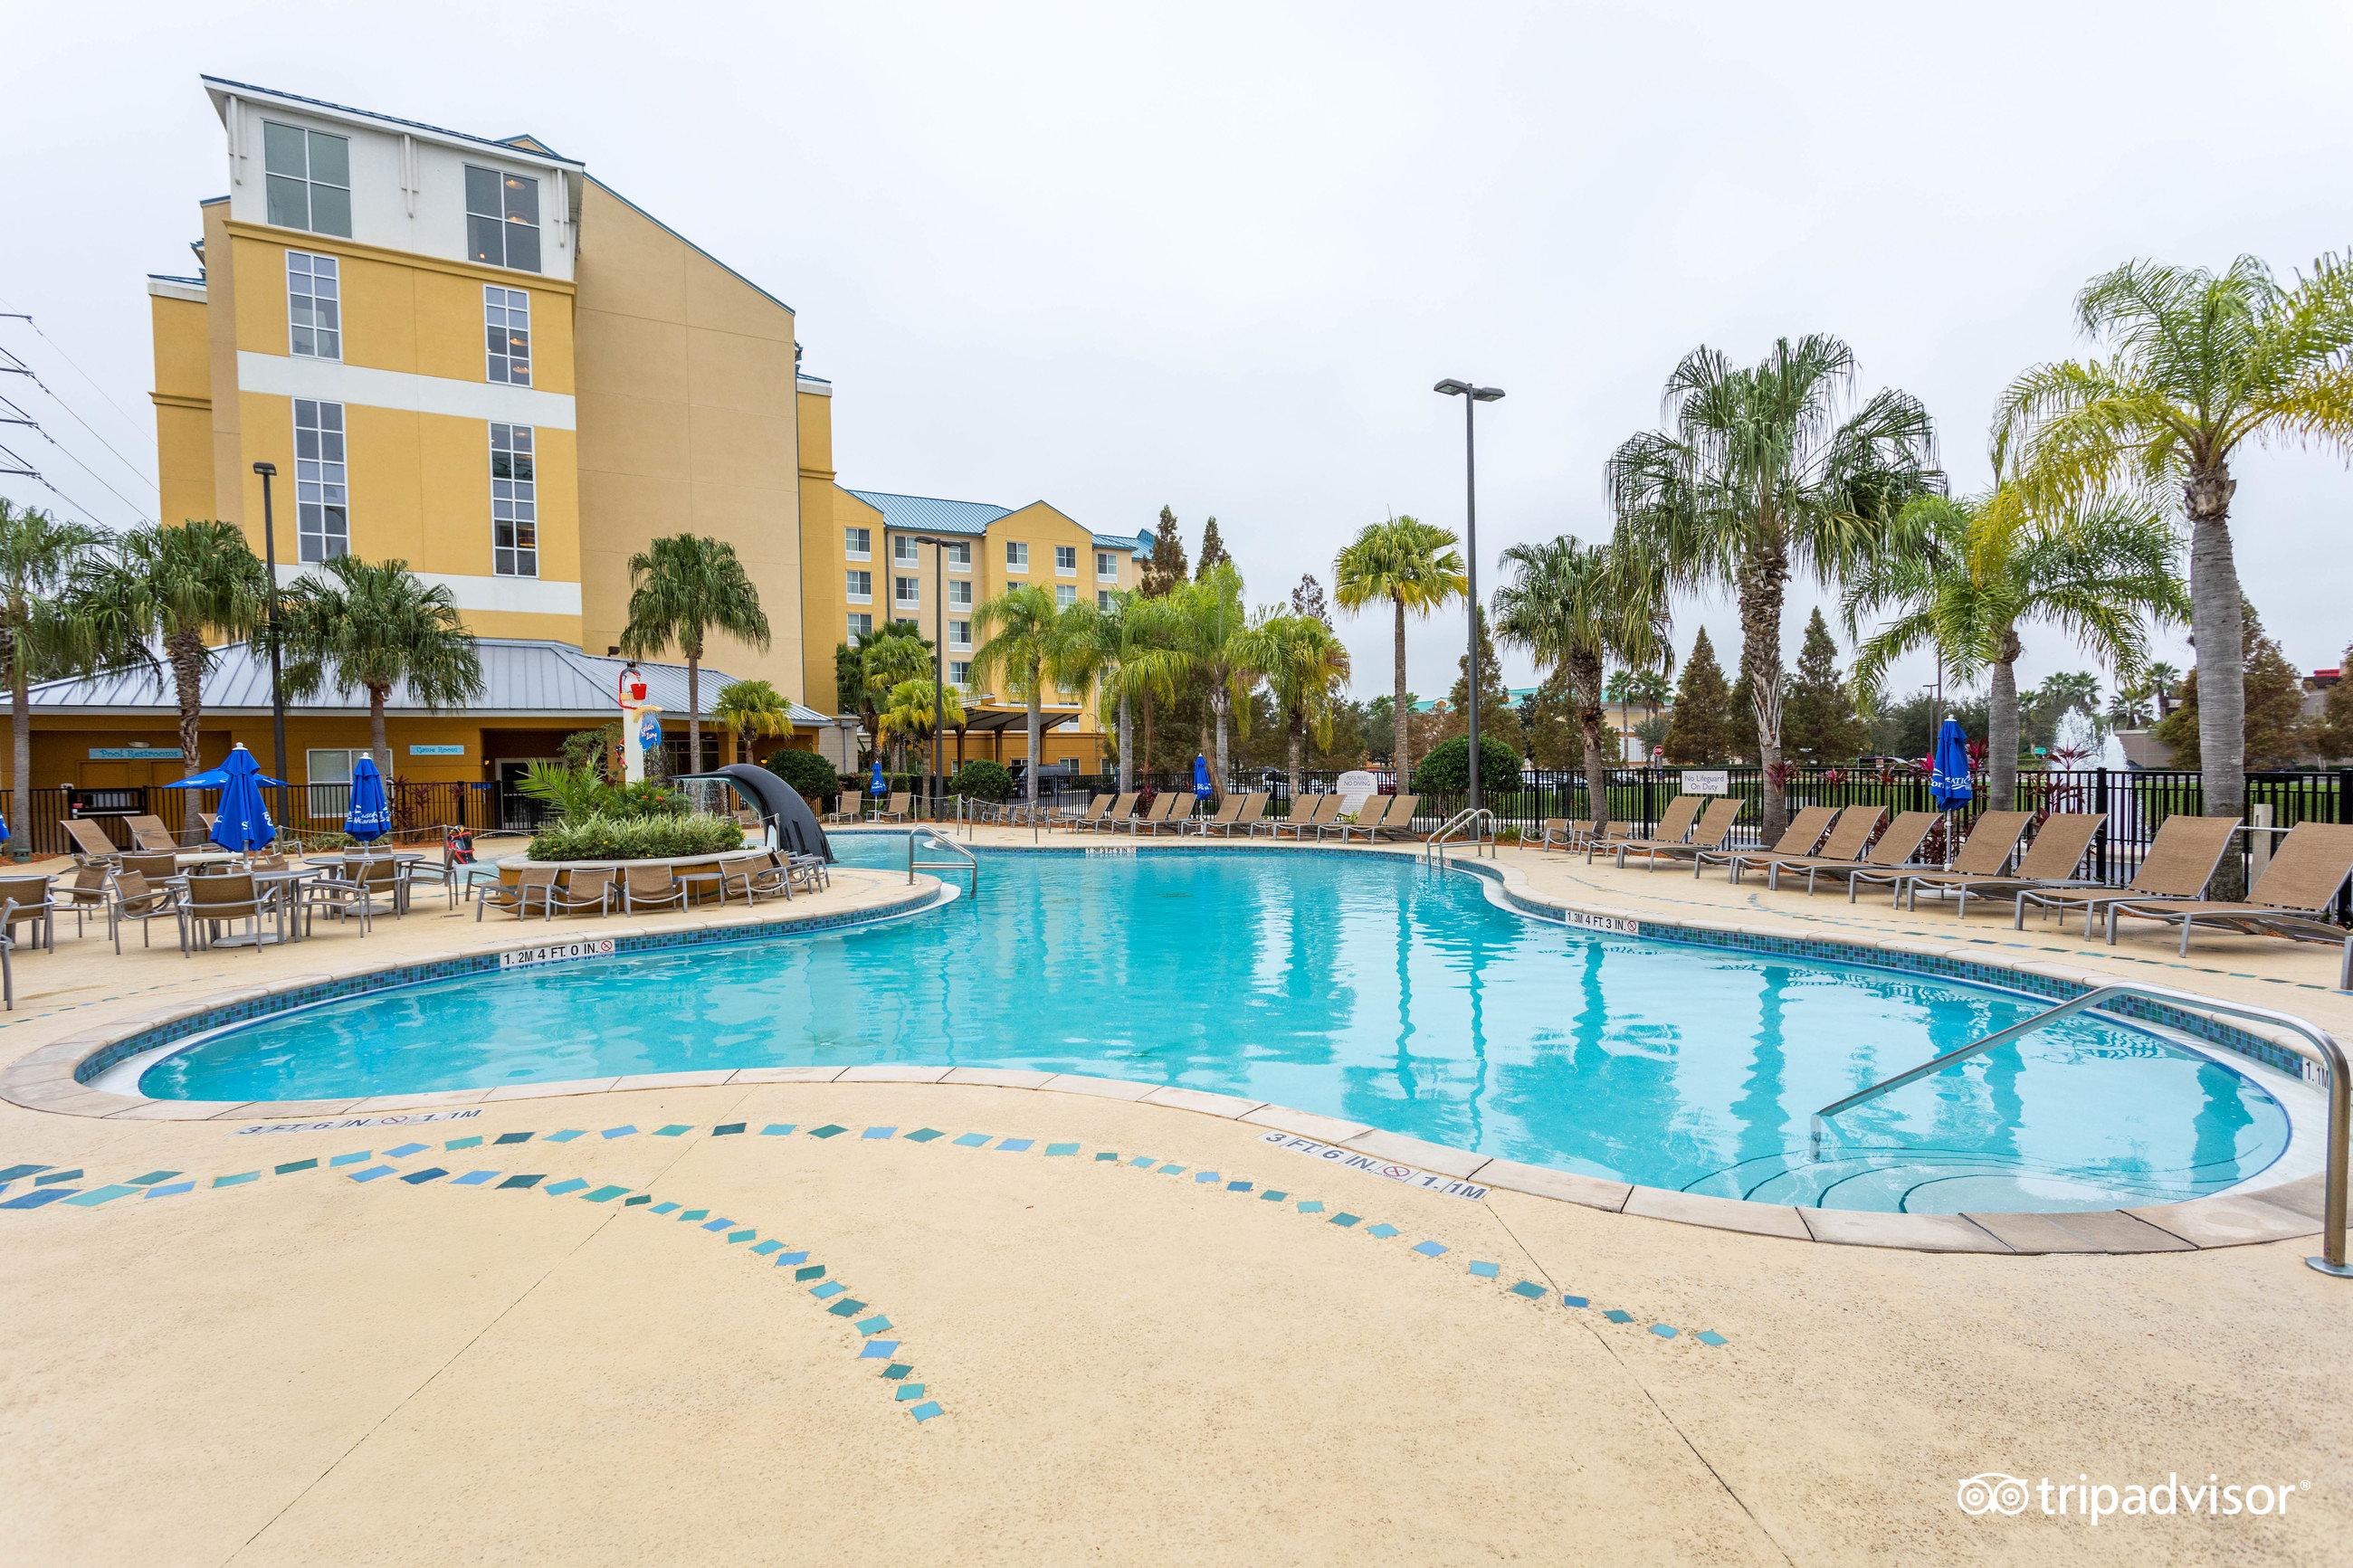 Fairfield Inn & Suites Orlando at SeaWorld FL 2018 Hotel Review